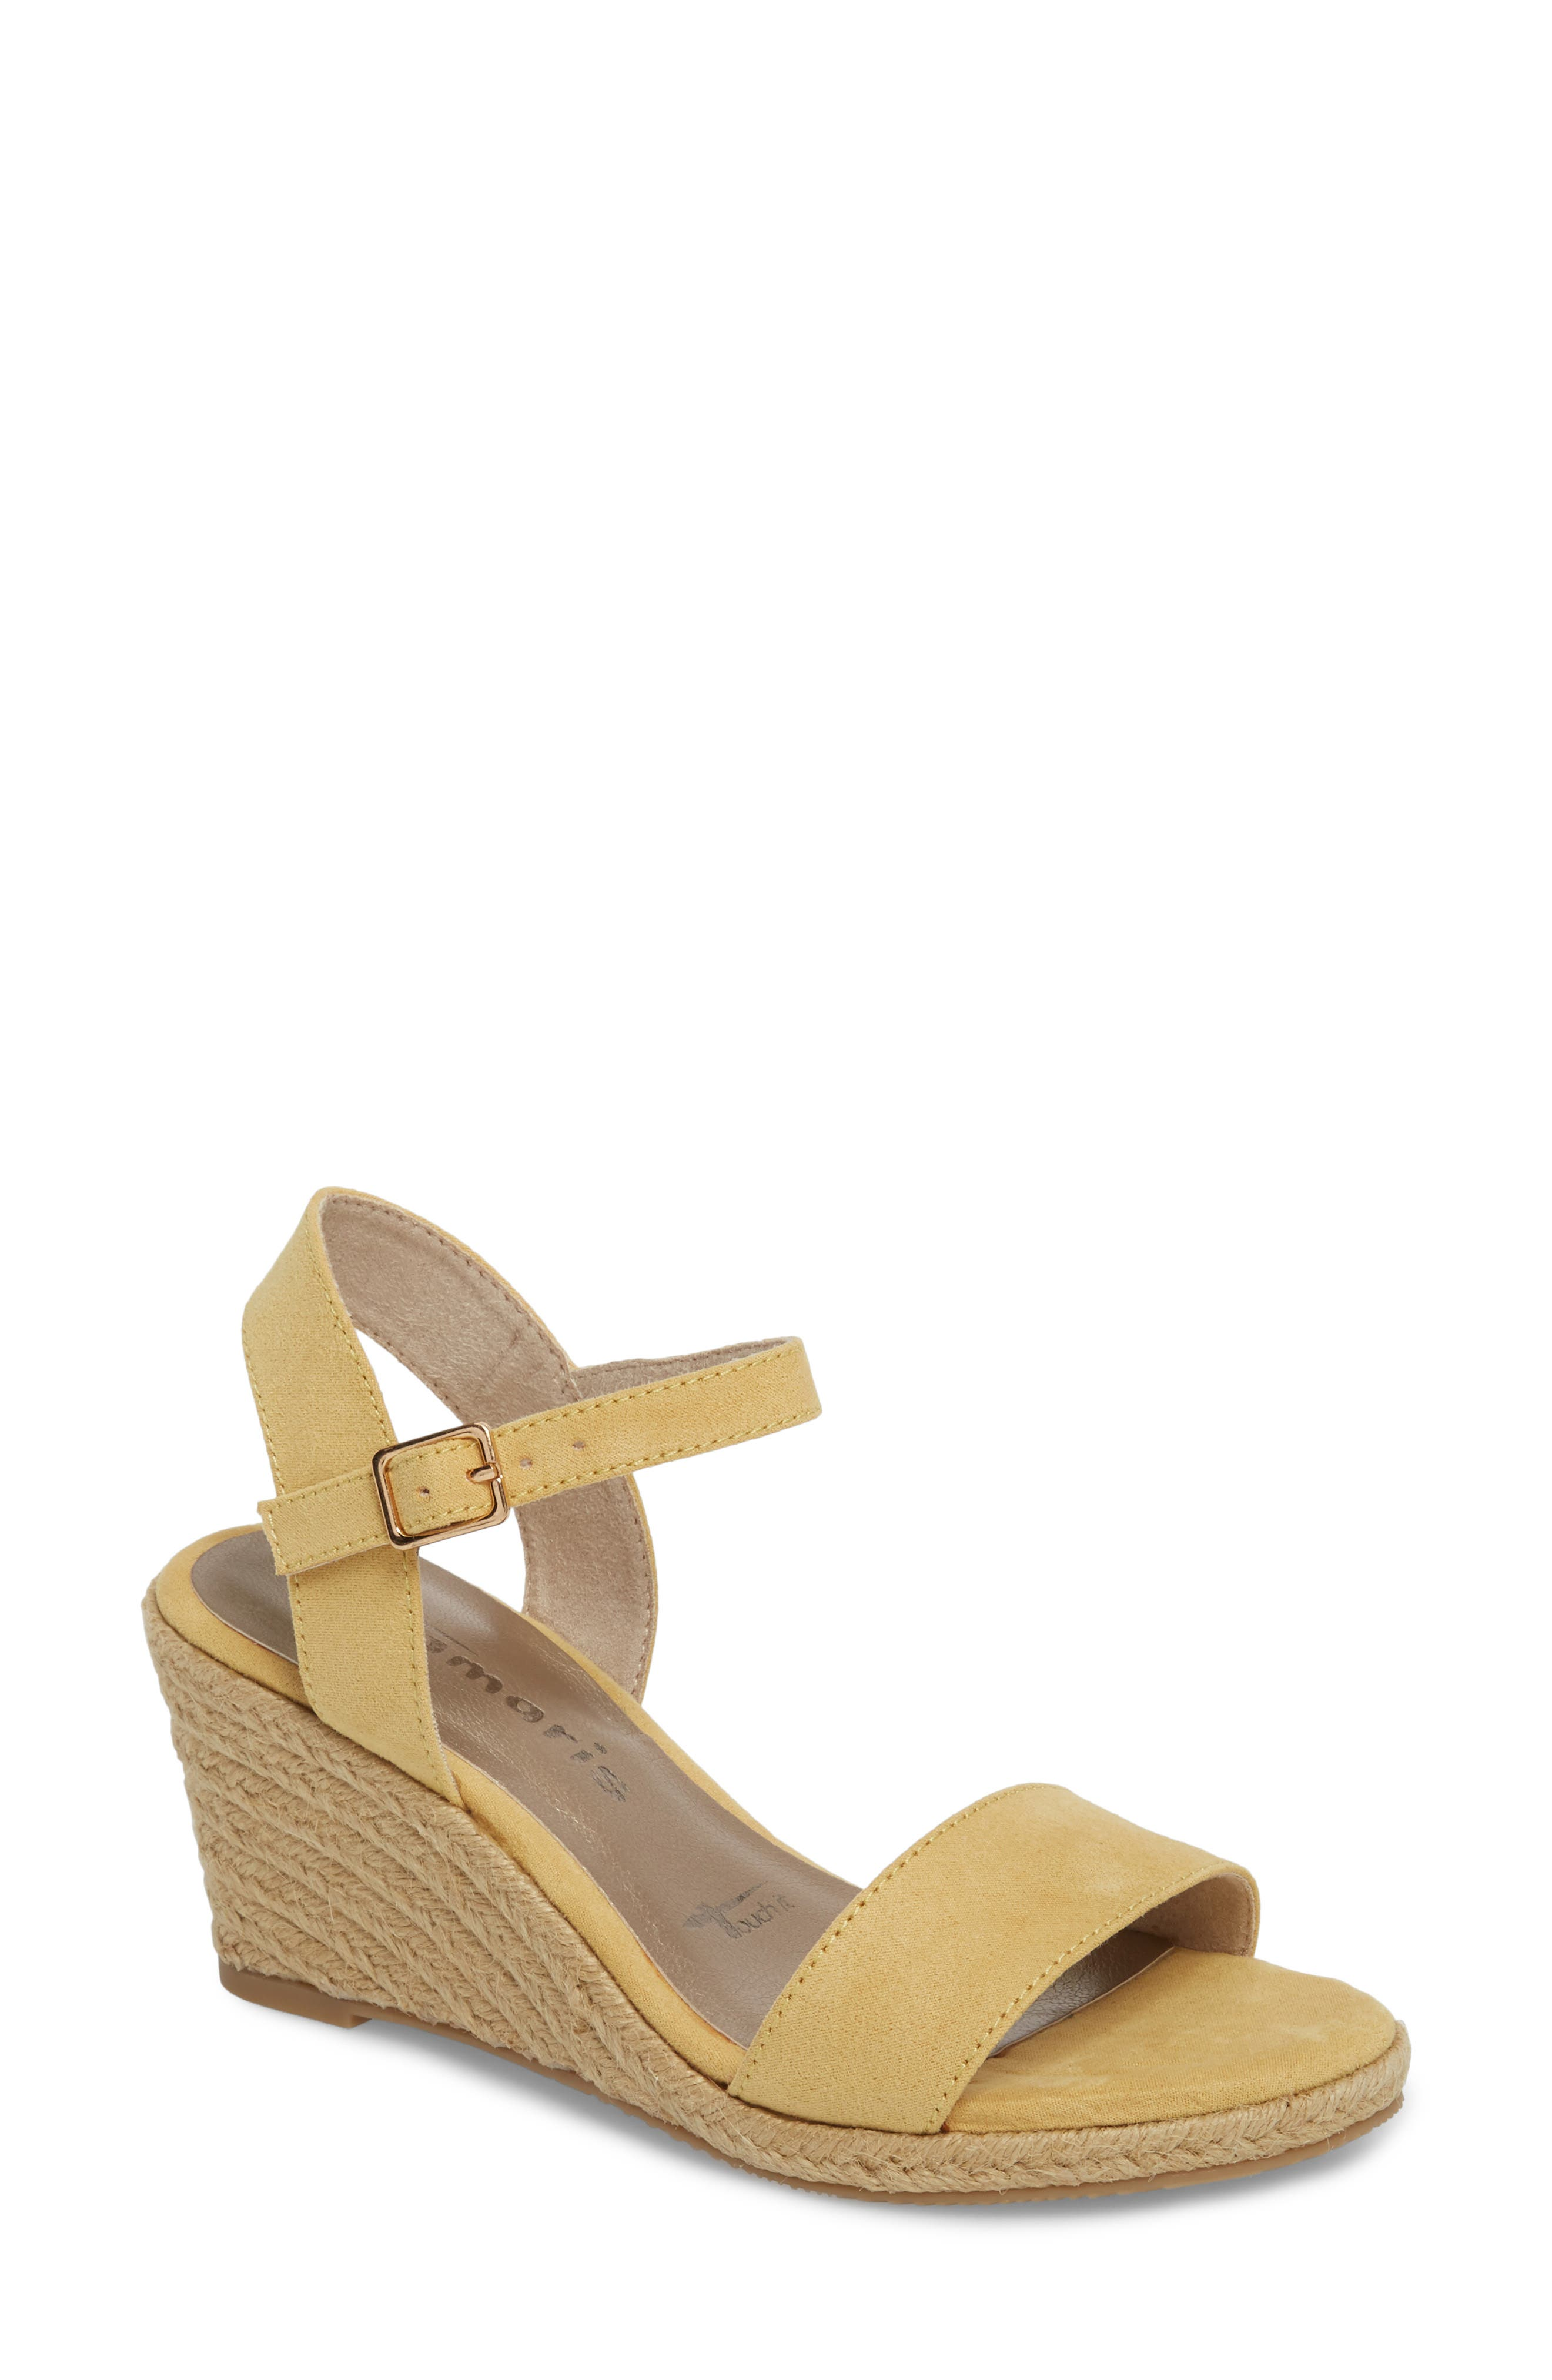 Livia Espadrille Wedge Sandal,                         Main,                         color, Saffron Fabric